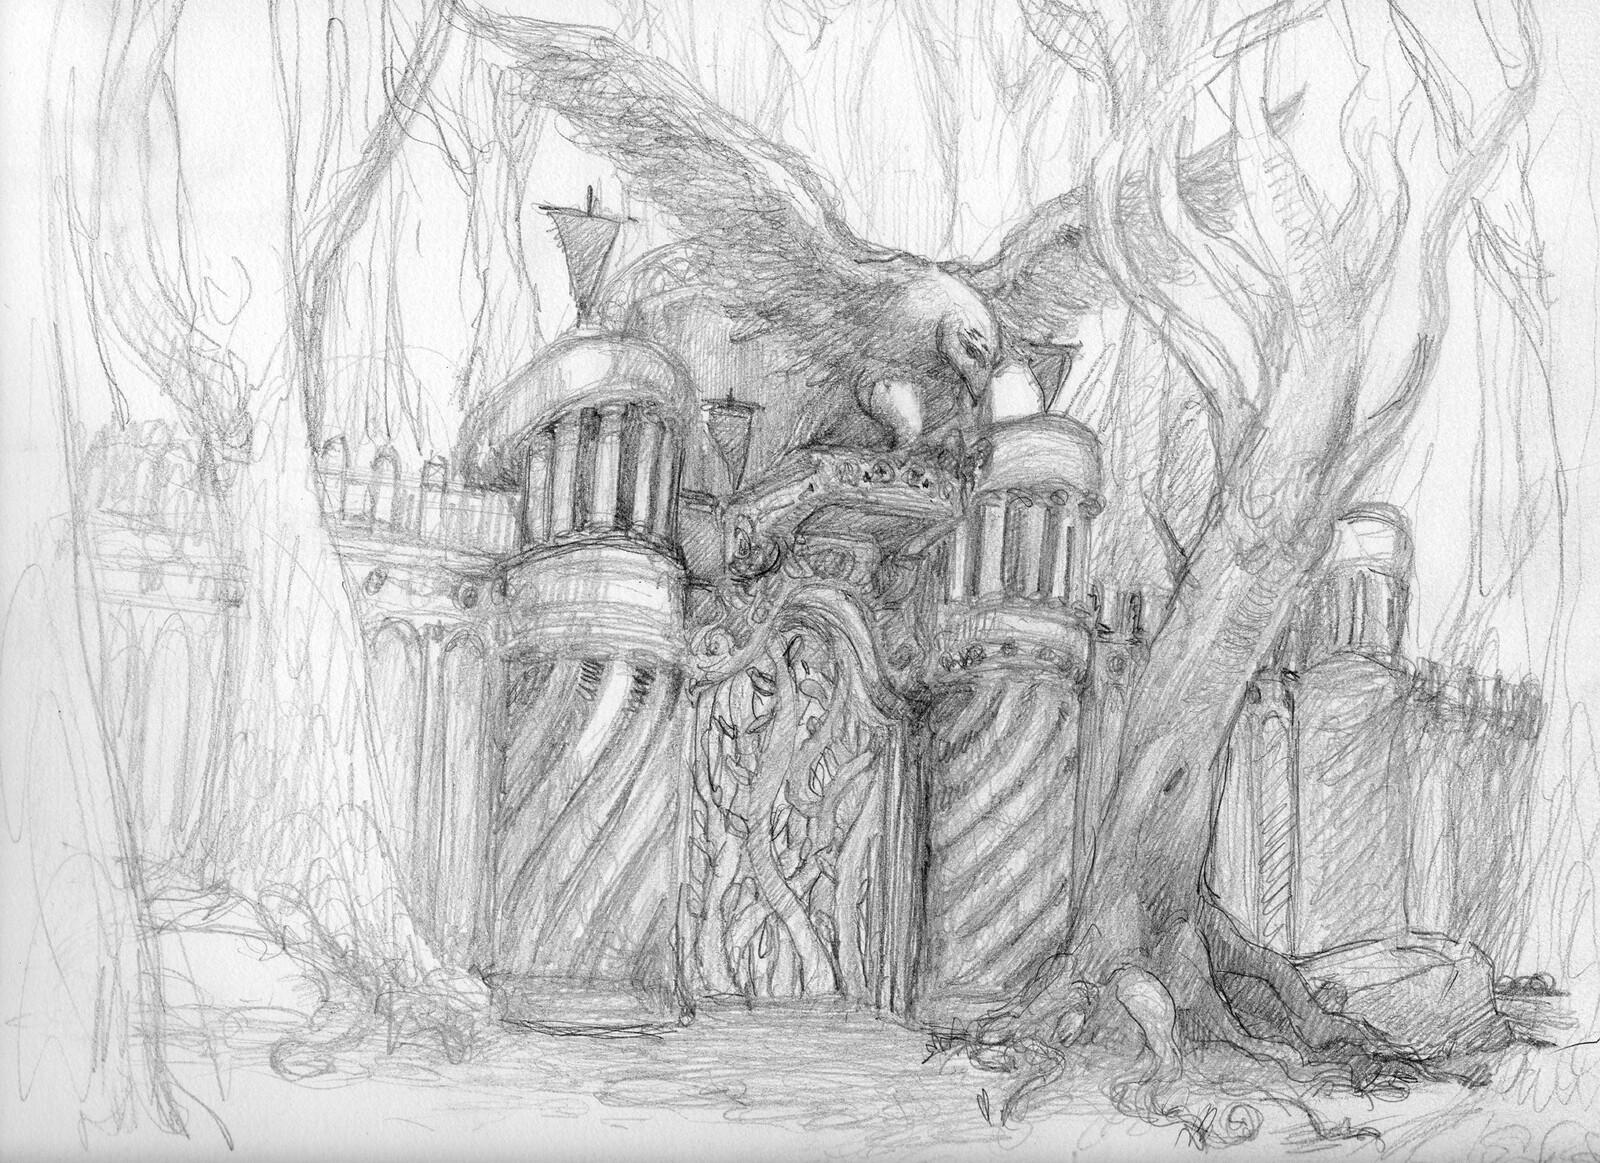 Gondolin Iron Gate pencil sketch 2